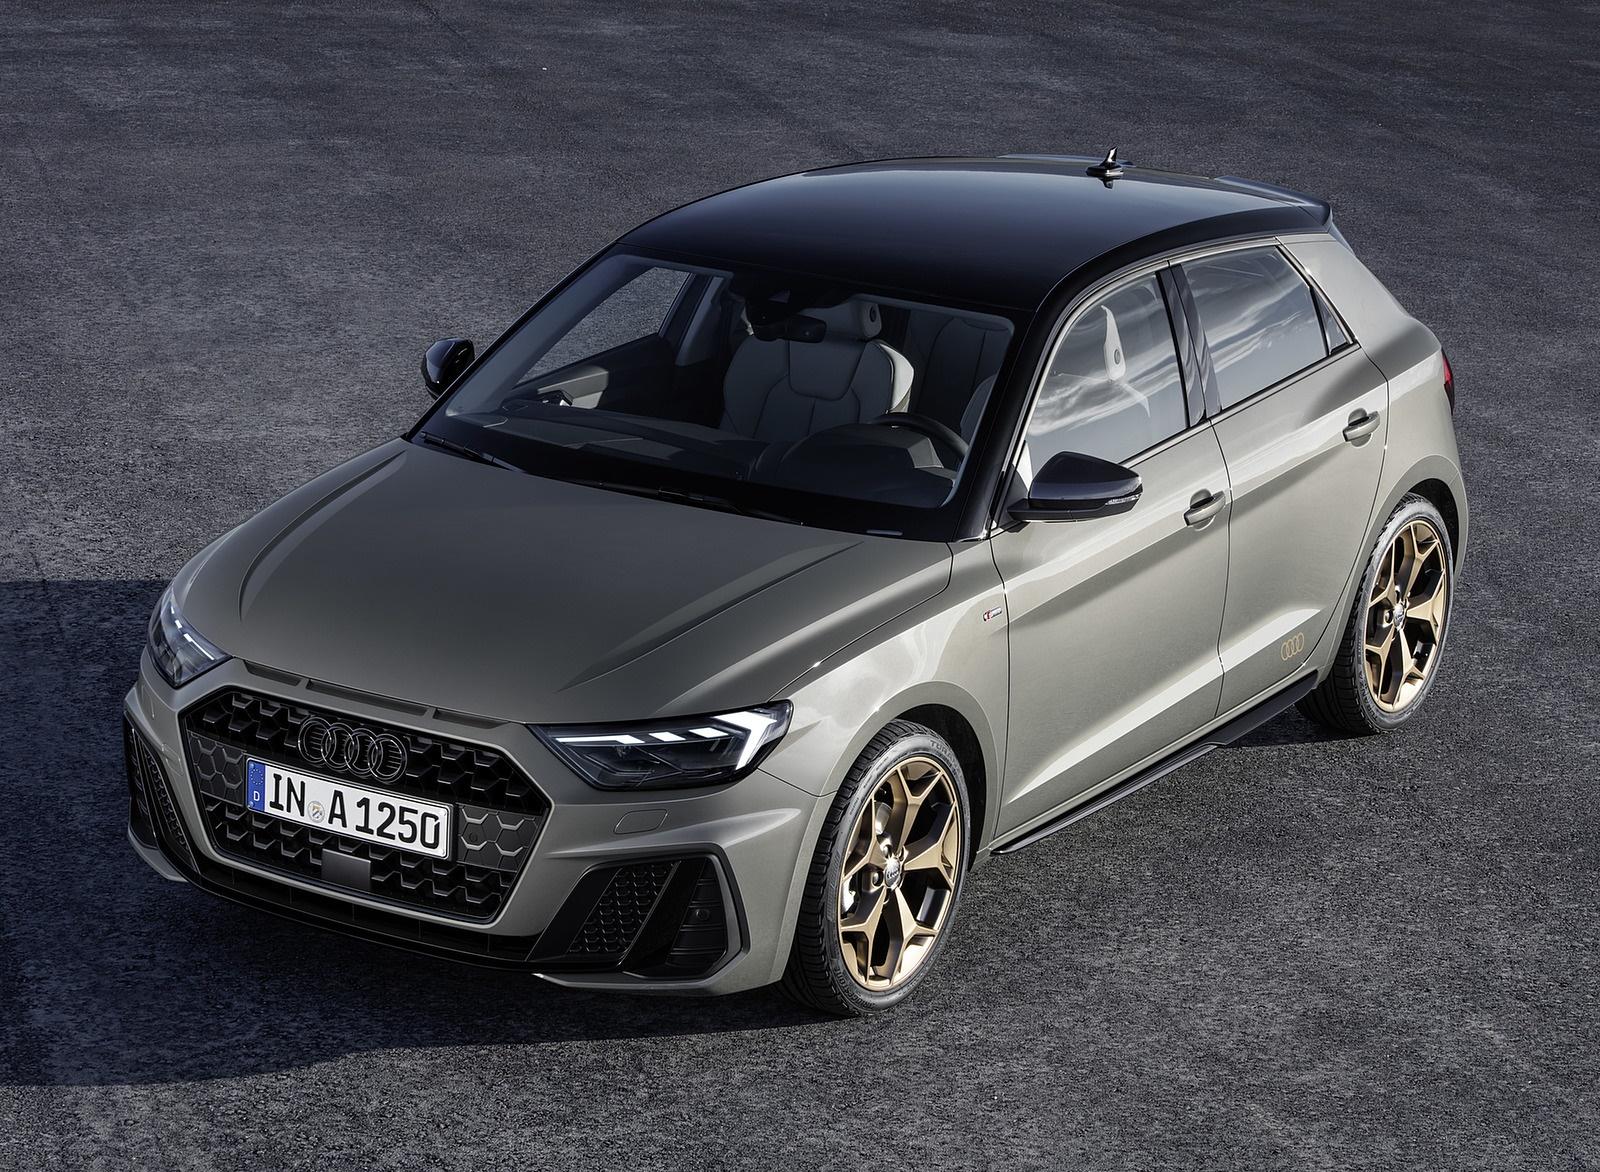 2019 Audi A1 Sportback (Color: Chronos Grey) Front Three-Quarter Wallpapers (4)